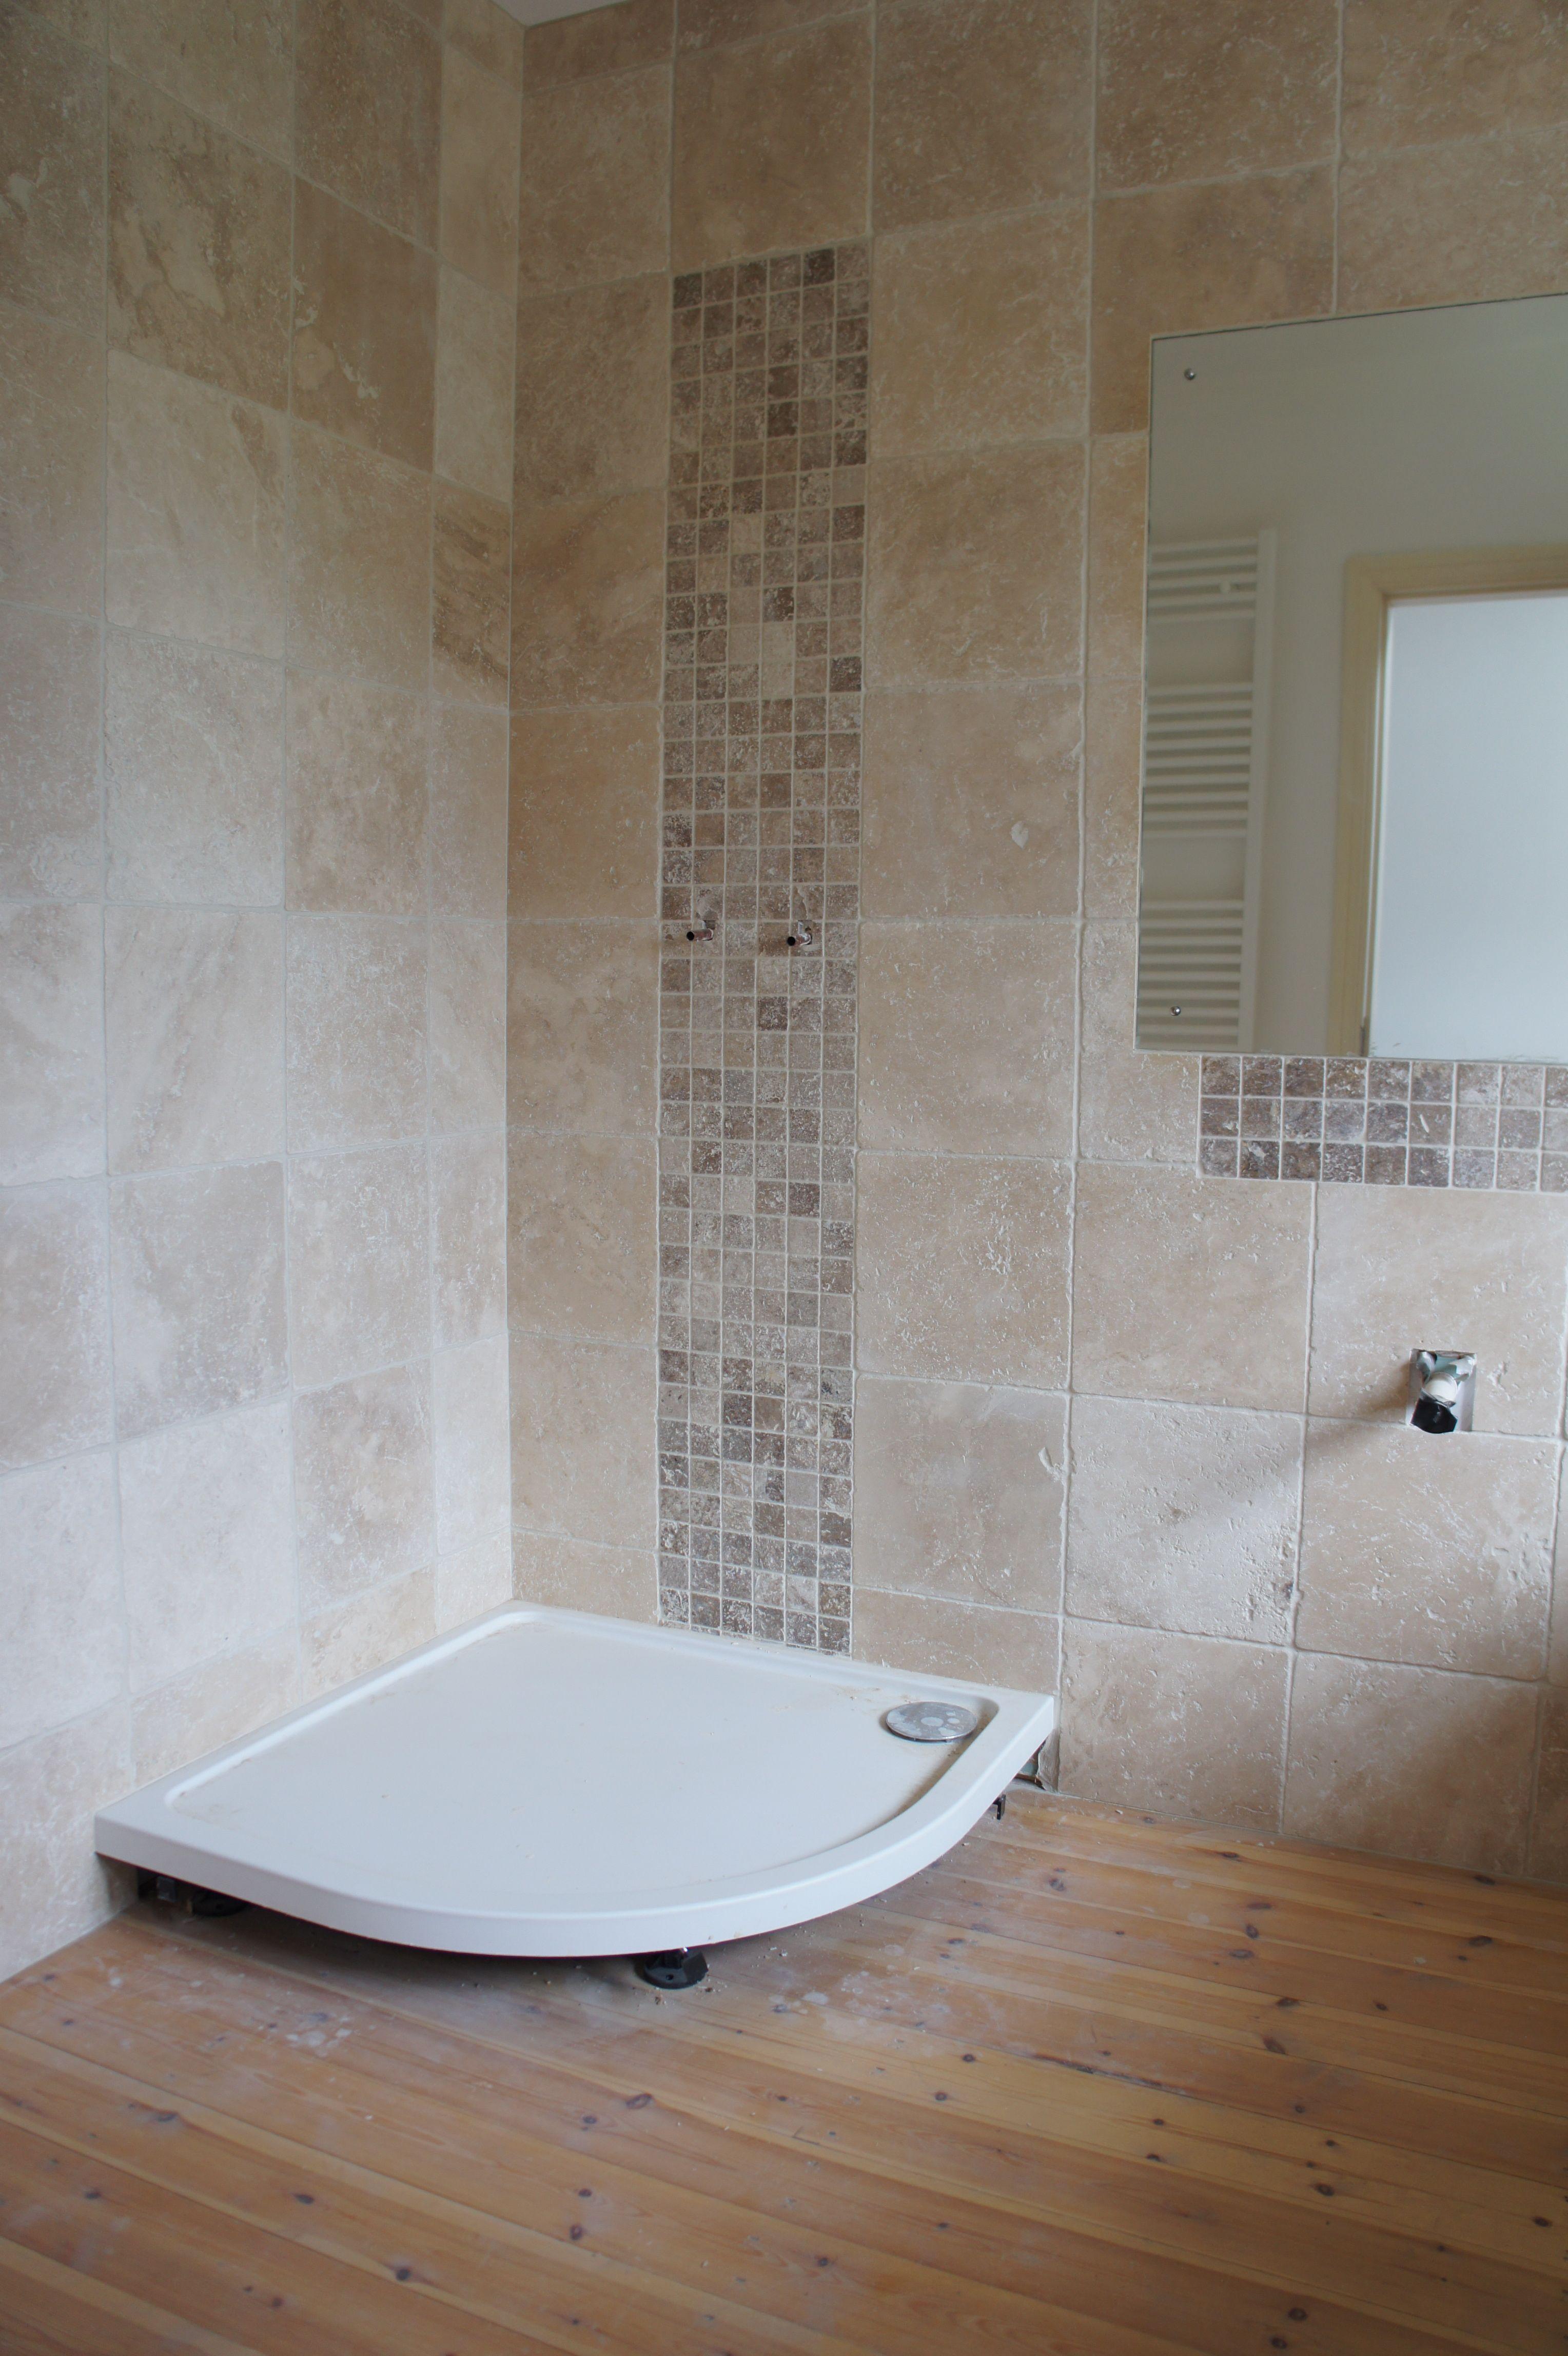 flooring bathroom silver tiles grey travertine stormy source backsplash tile gray stone